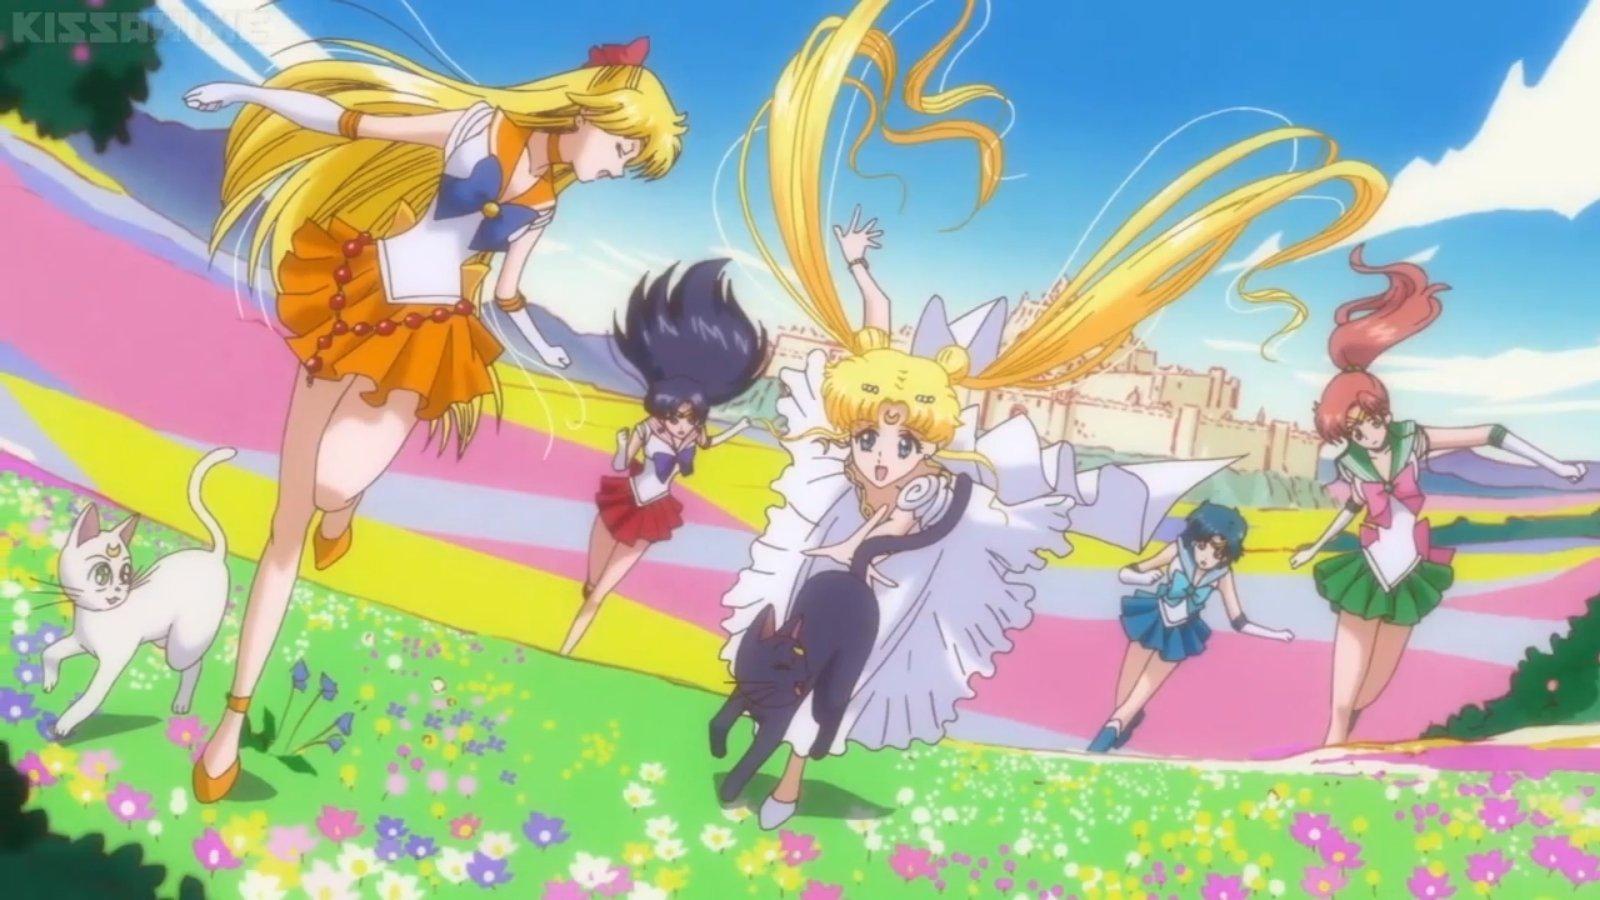 44 Sailor Moon Group Wallpaper On Wallpapersafari